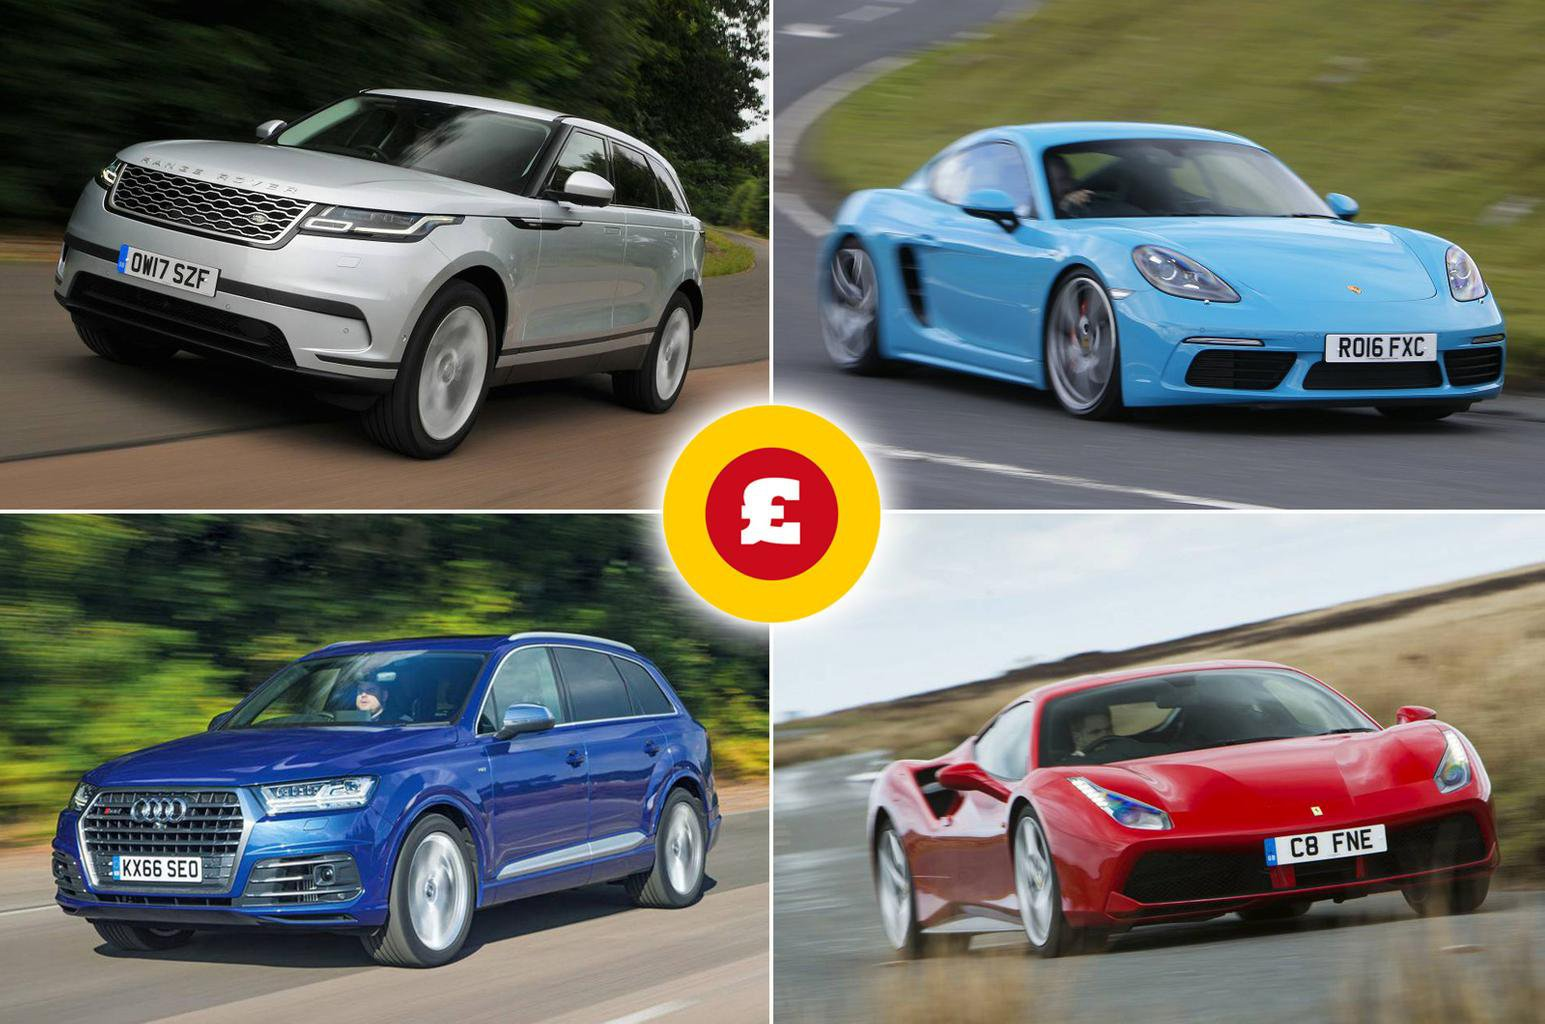 Slowest depreciating cars